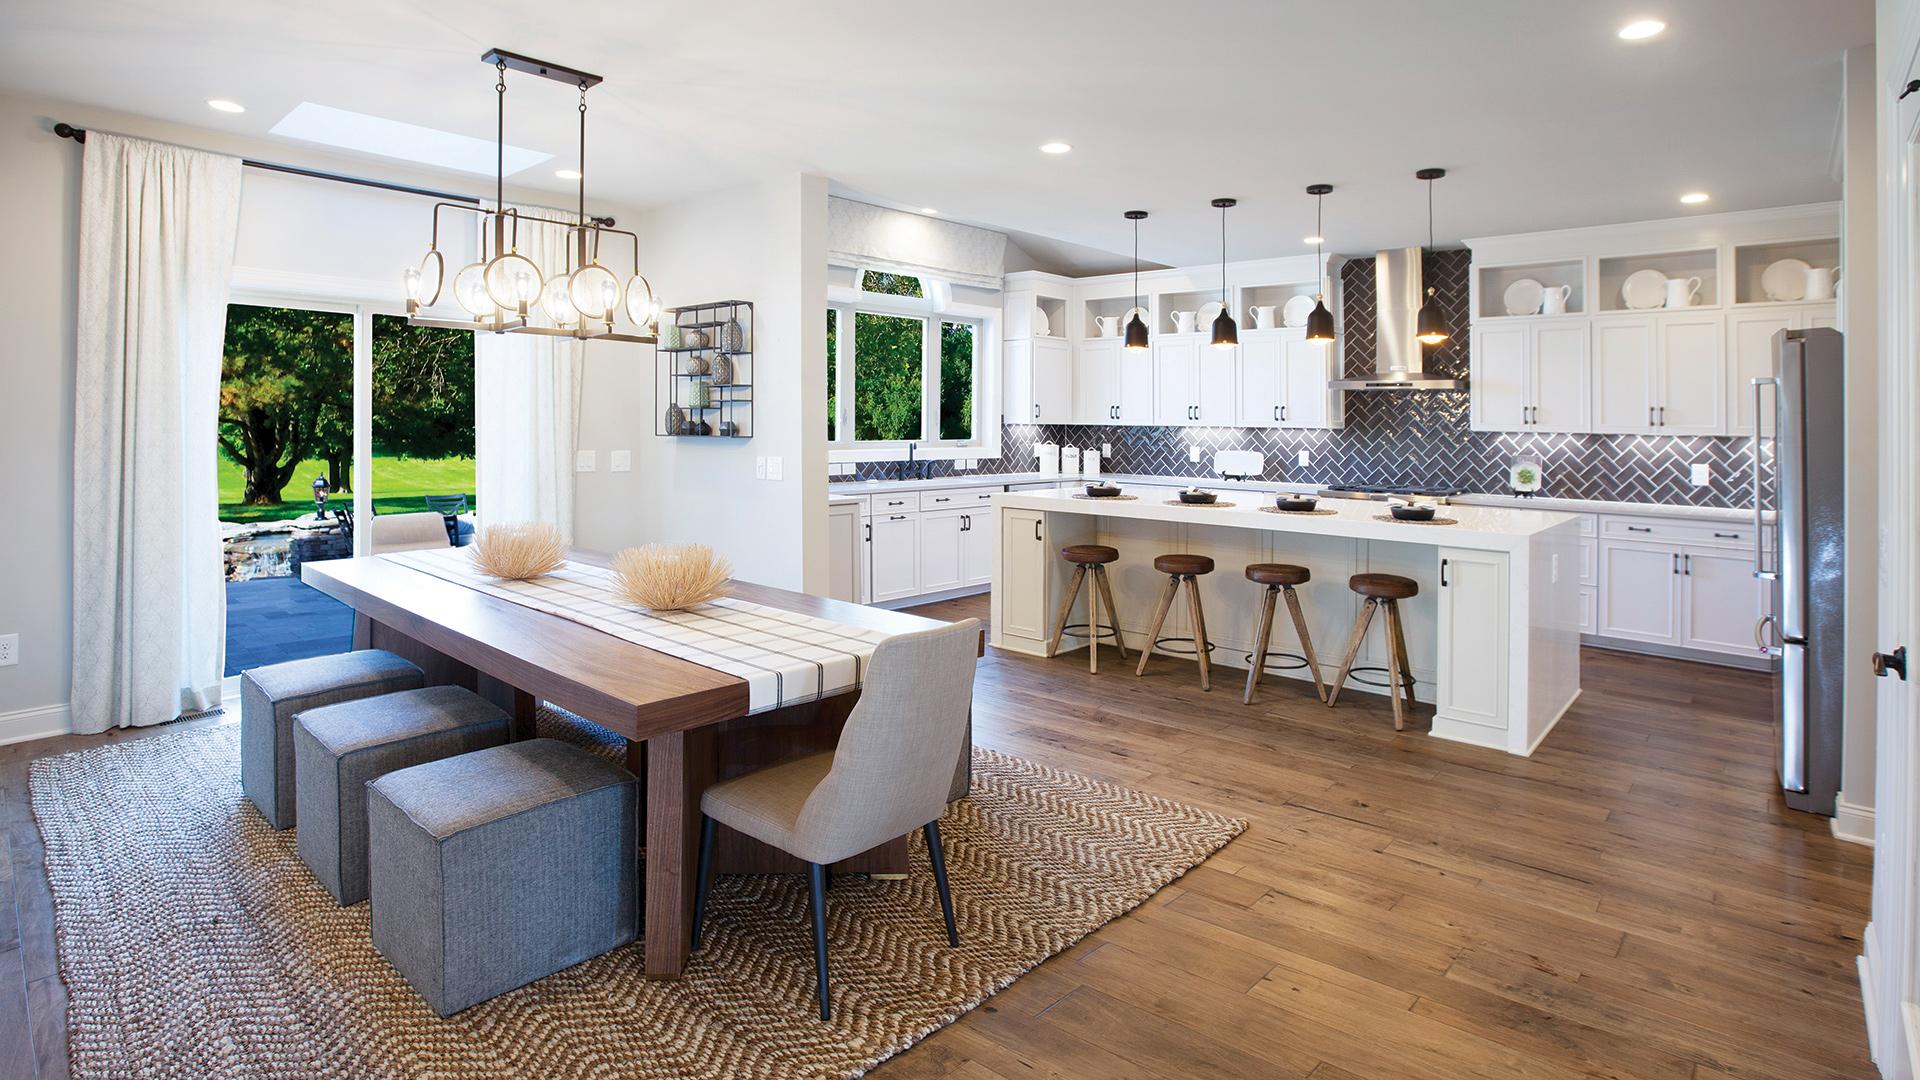 Gorgeous gourmet kitchens designed for entertaining